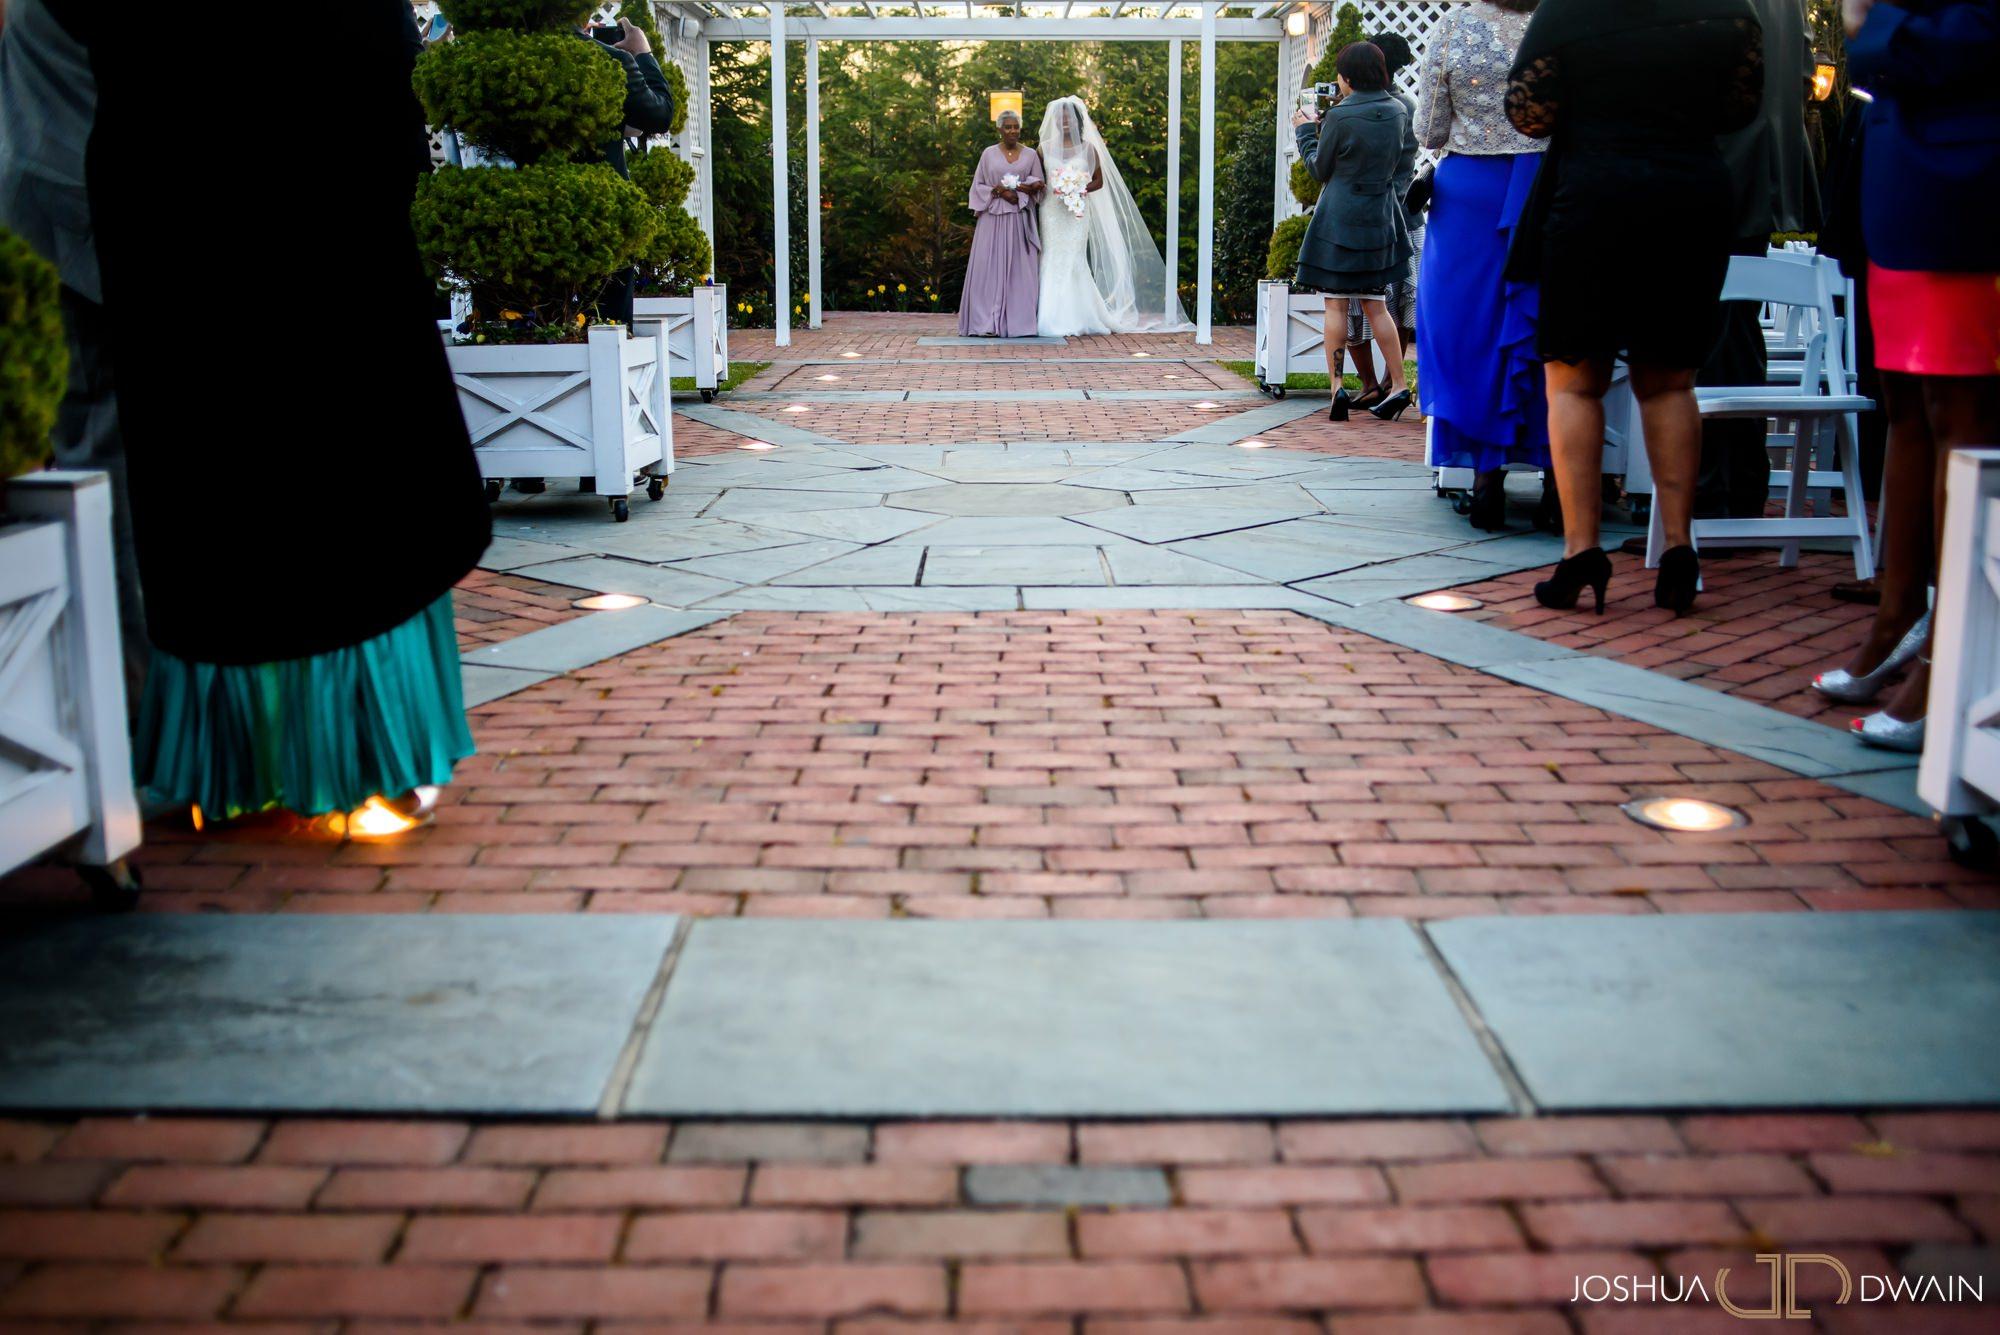 regine-jevon-012-26-crest-hollow-long-island-wedding-photographer-joshua-dwain